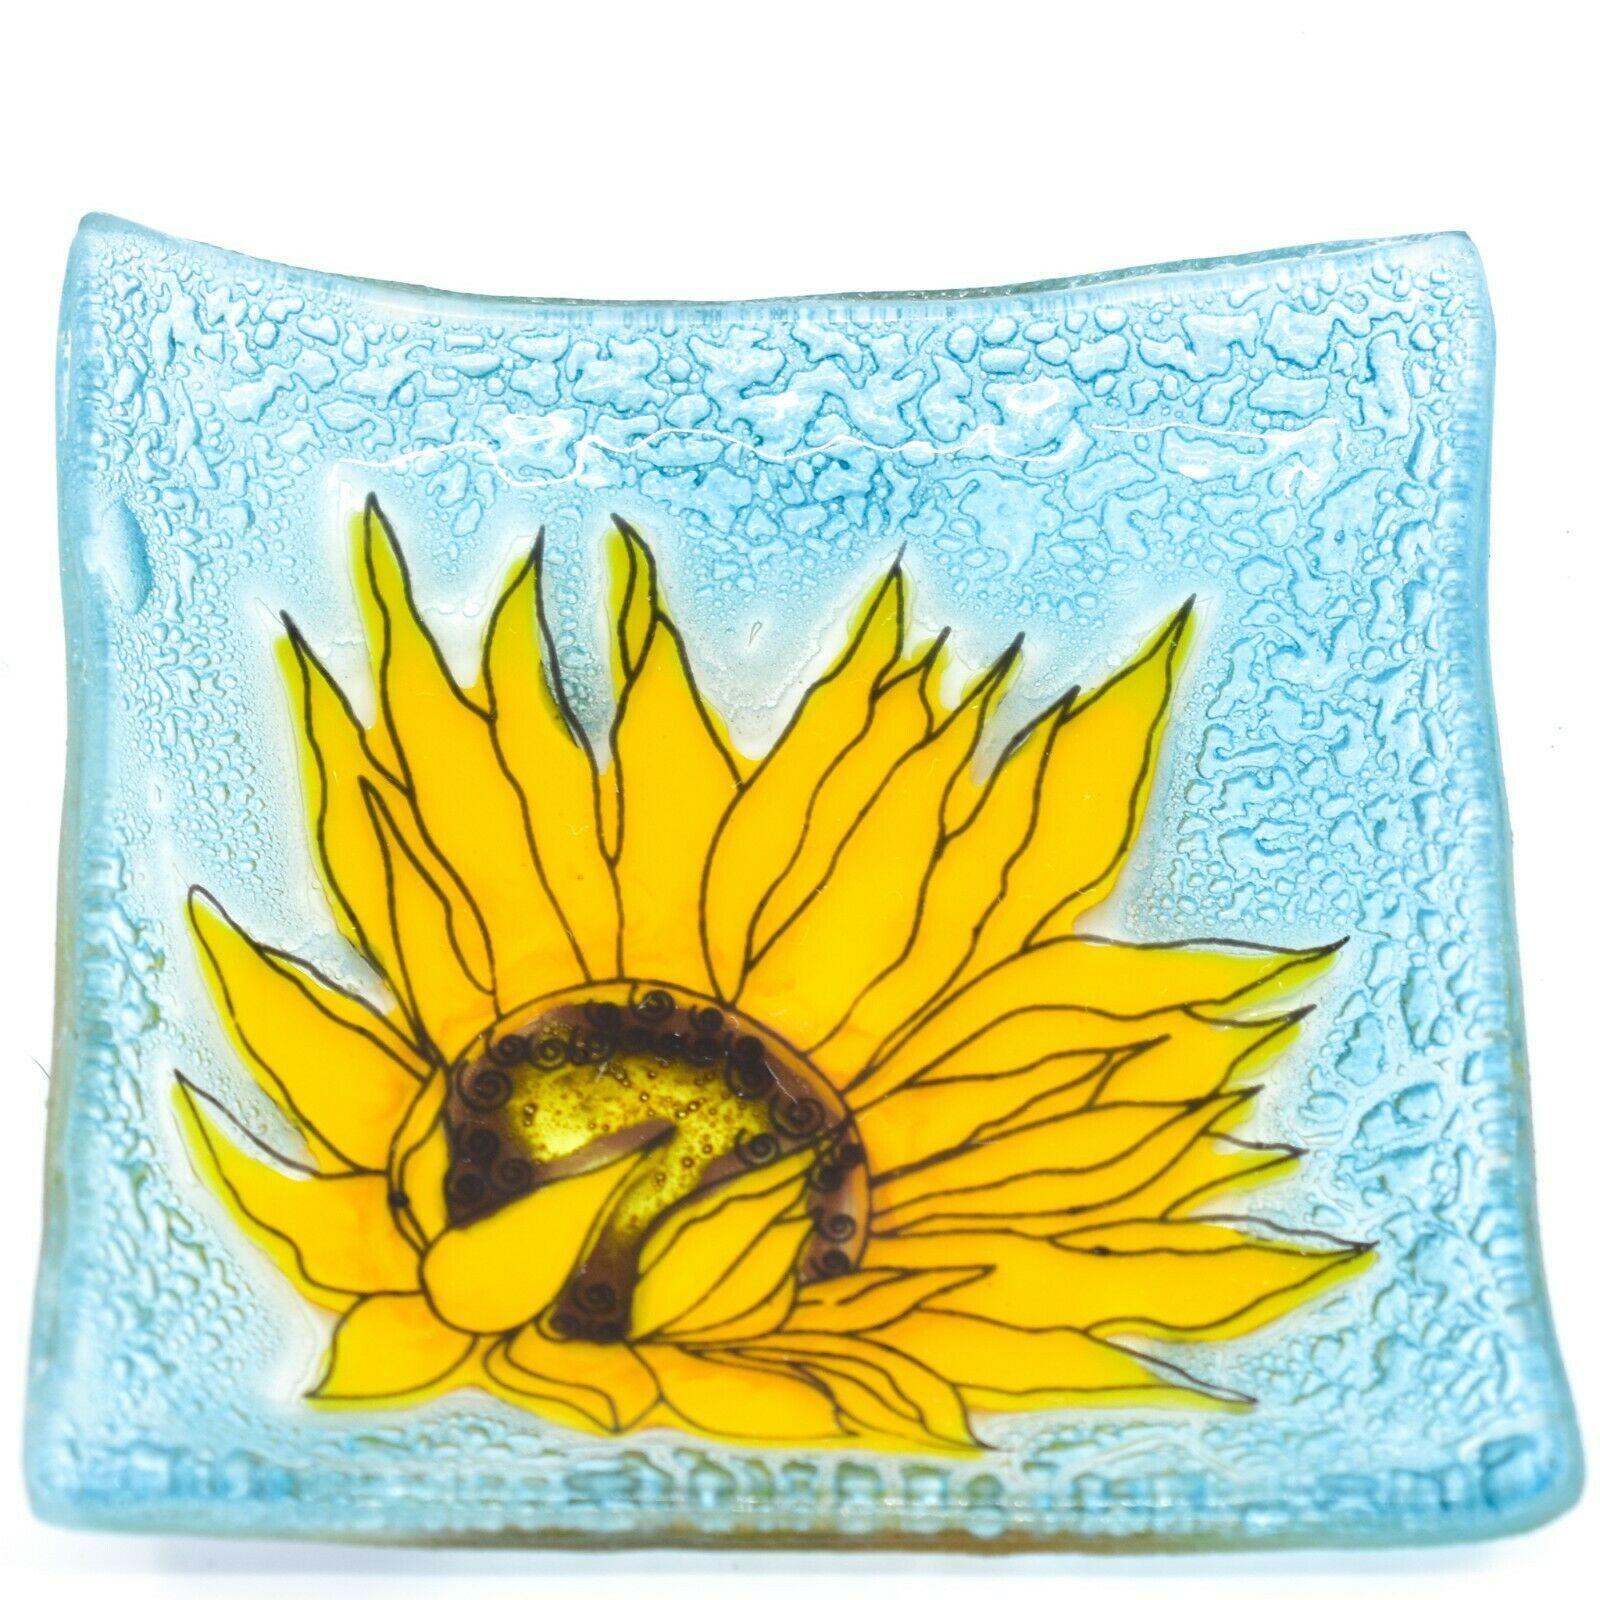 Fused Art Glass Yellow Sunflower Flower Design Square Soap Dish Handmade Ecuador